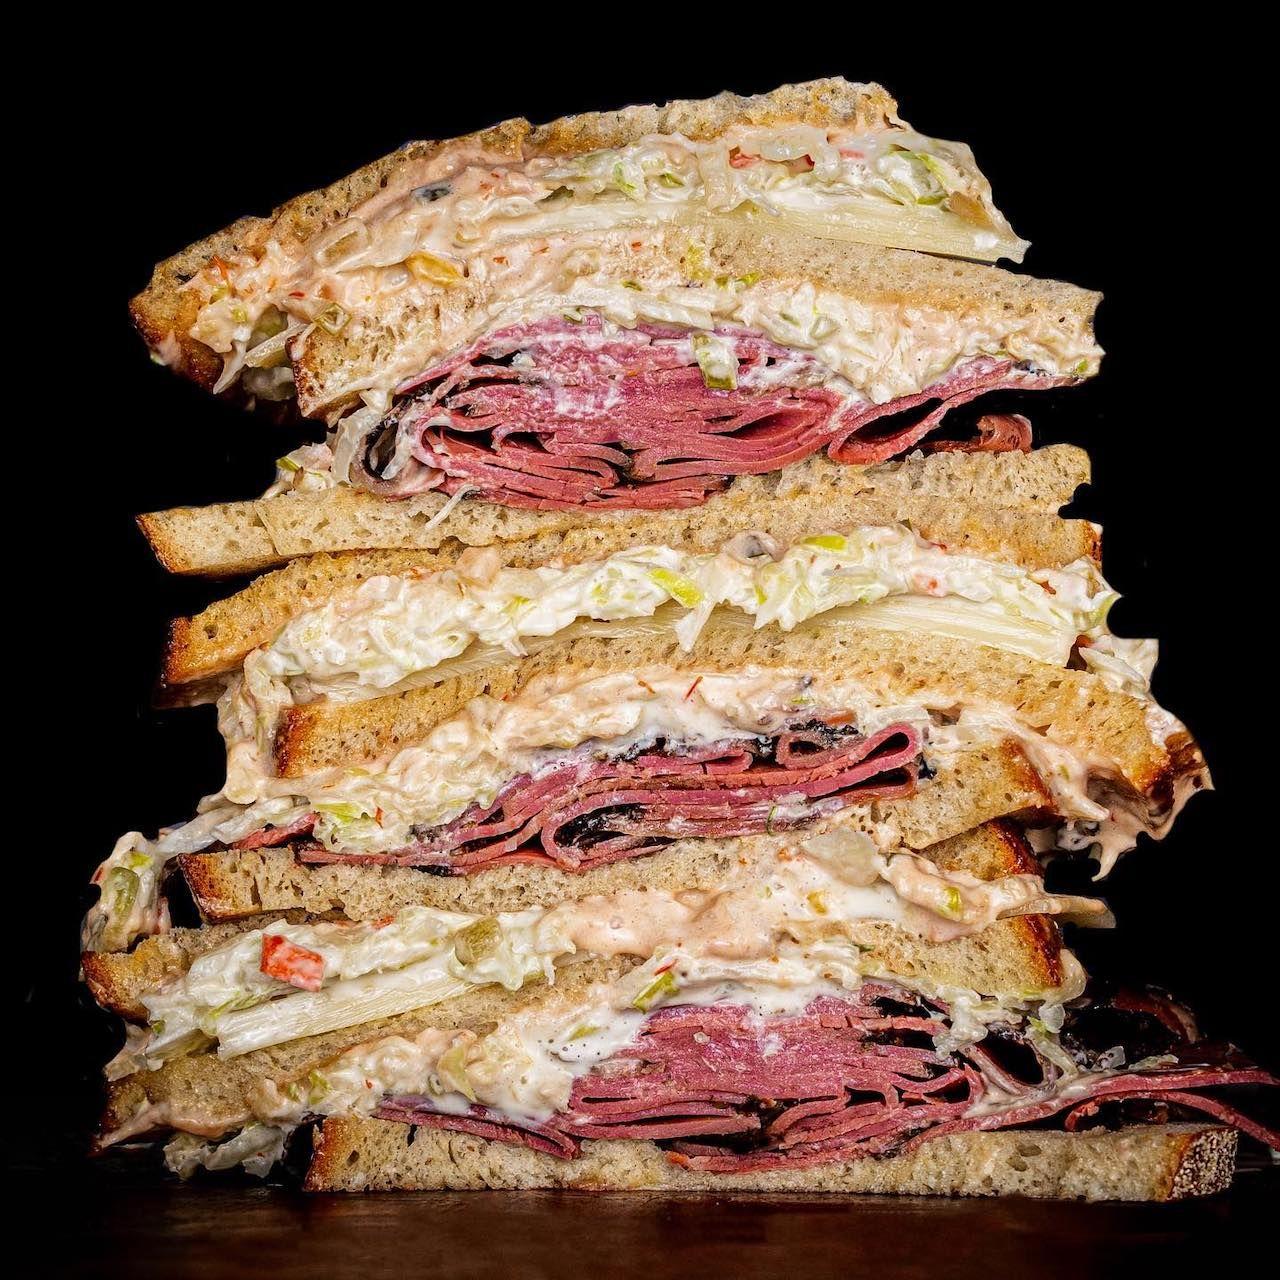 Millburn Deli, New Jersey sandwiches